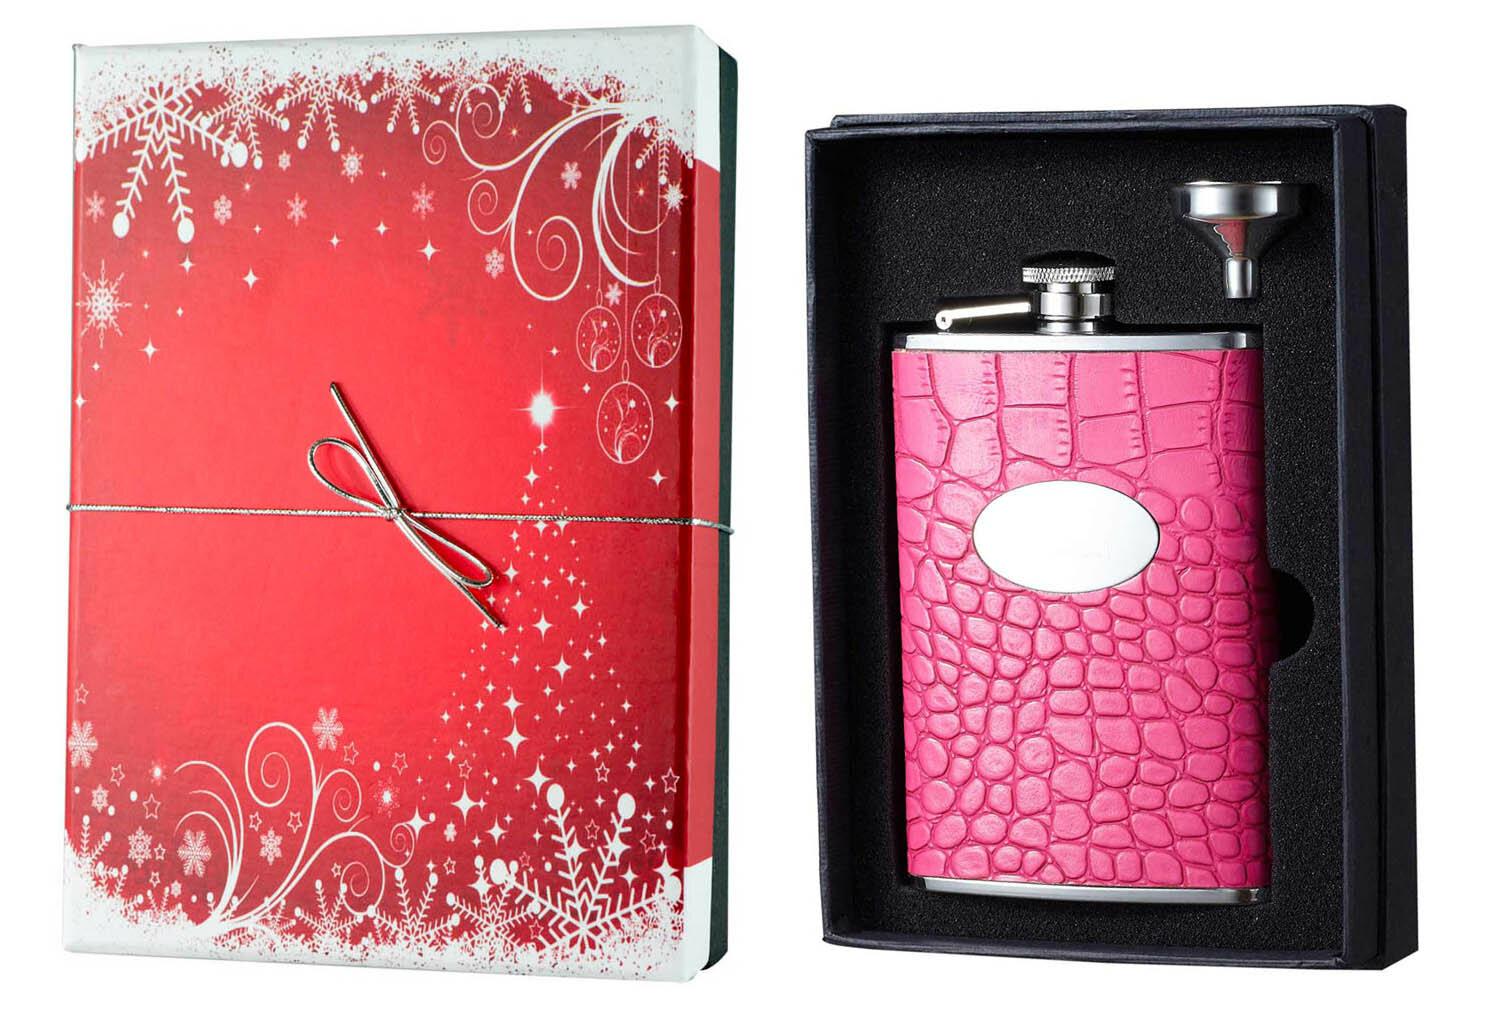 Visol Products Essential Ii Arojo Hot Leather Holiday Liquor Flask Gift Set Wayfair